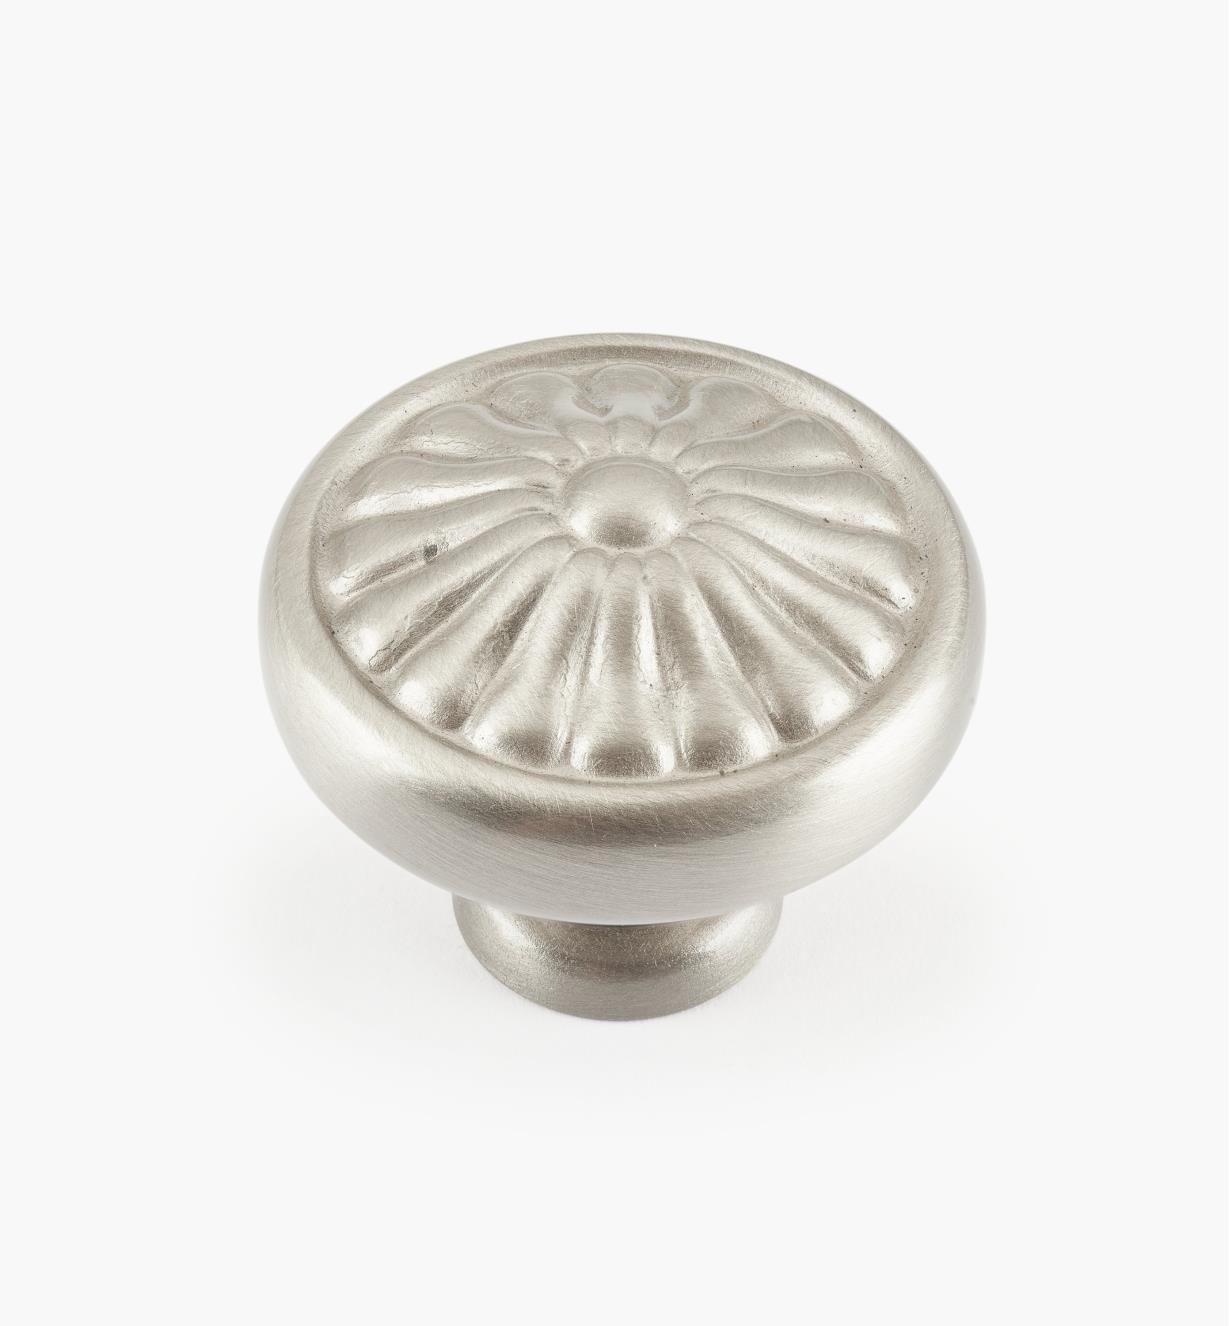 01W4030 - Bouton à pétales, nickel satiné, 11/4pox1po